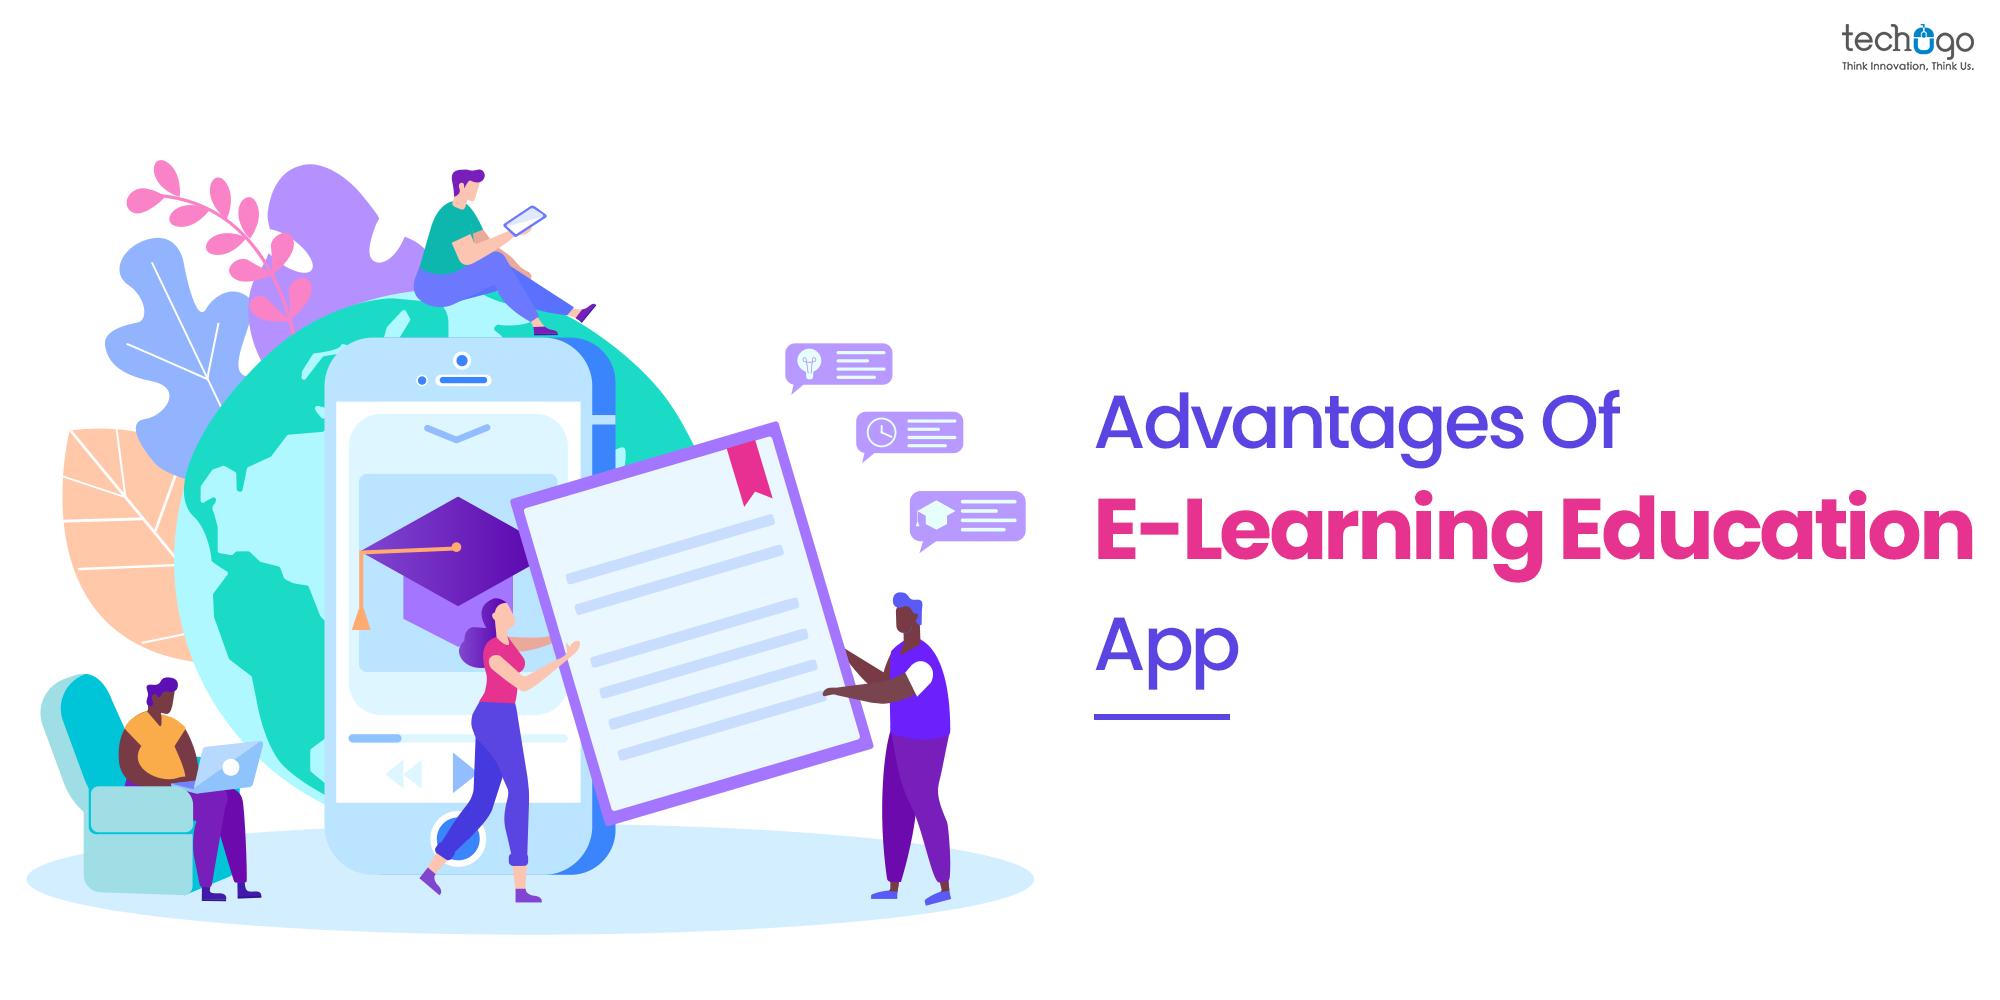 E-Learning Education App